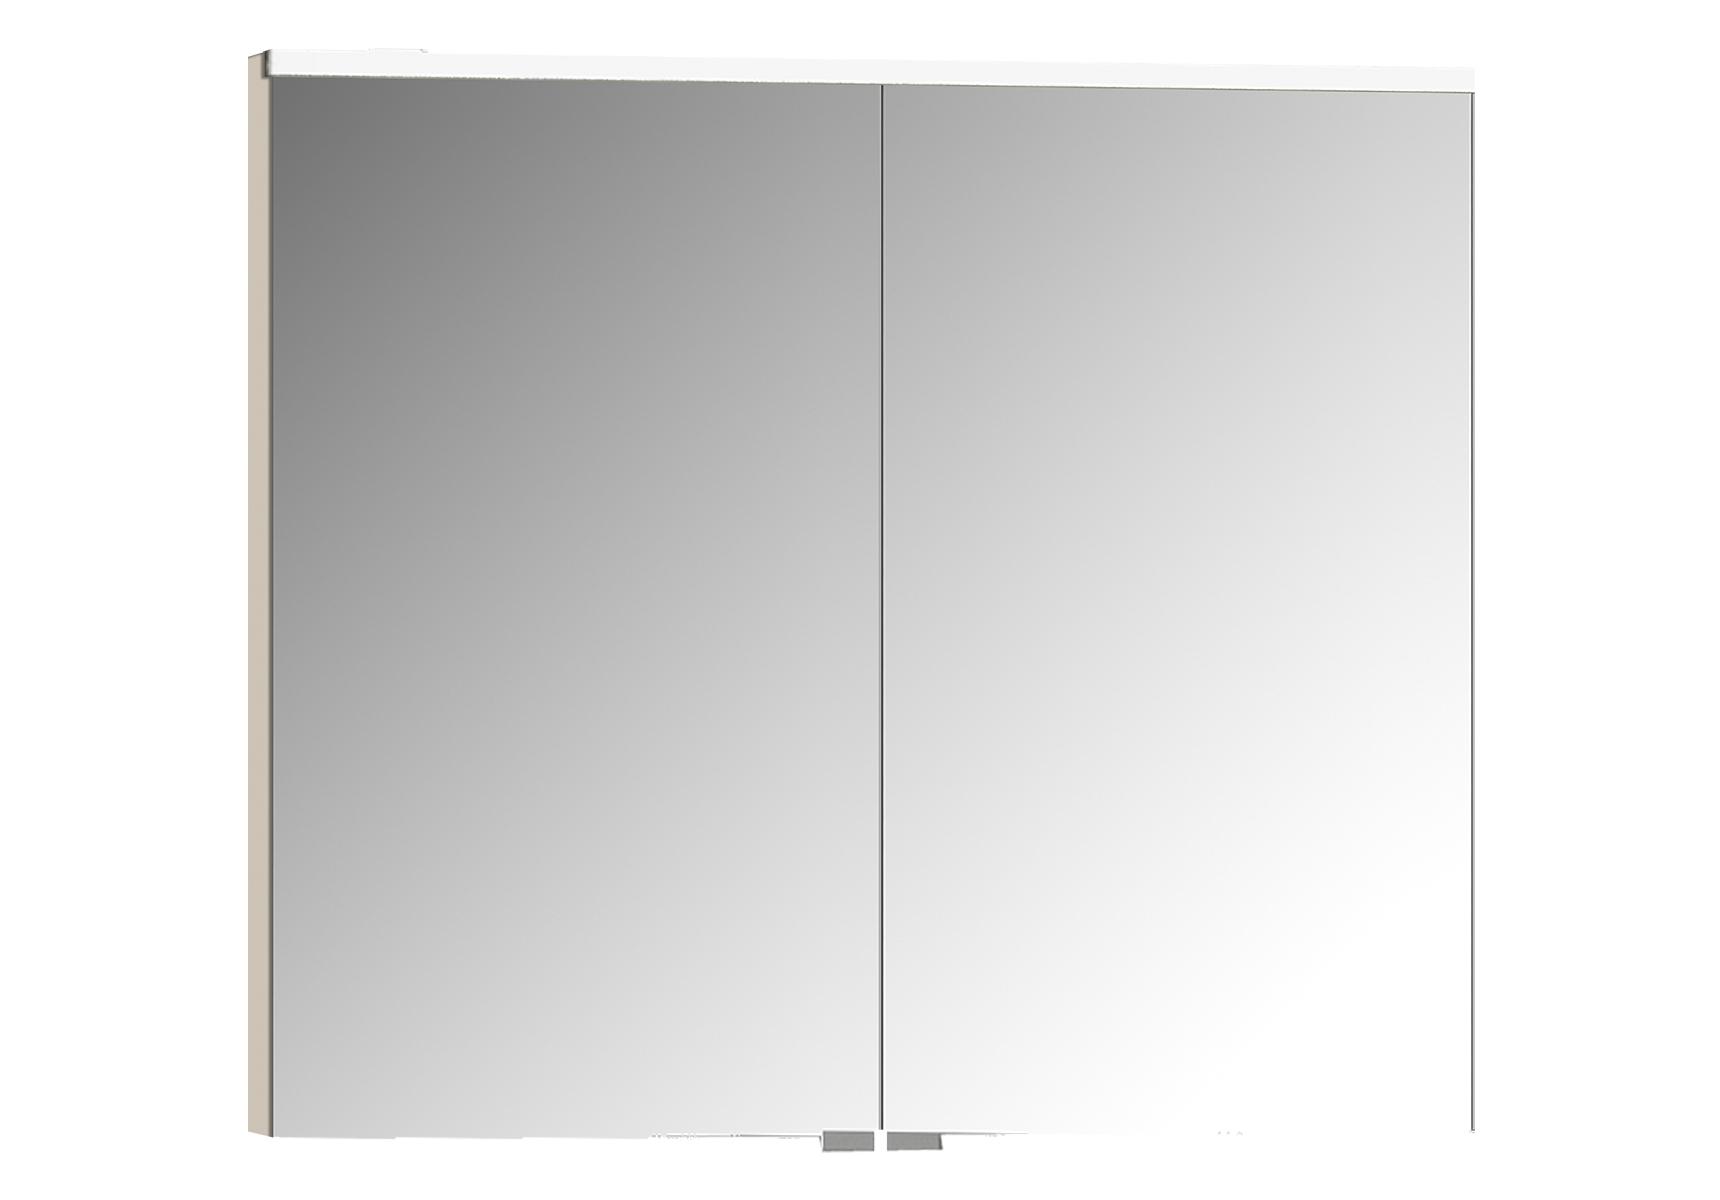 Sento Premium LED-Spiegelschrank, 80 cm, Crème Matt